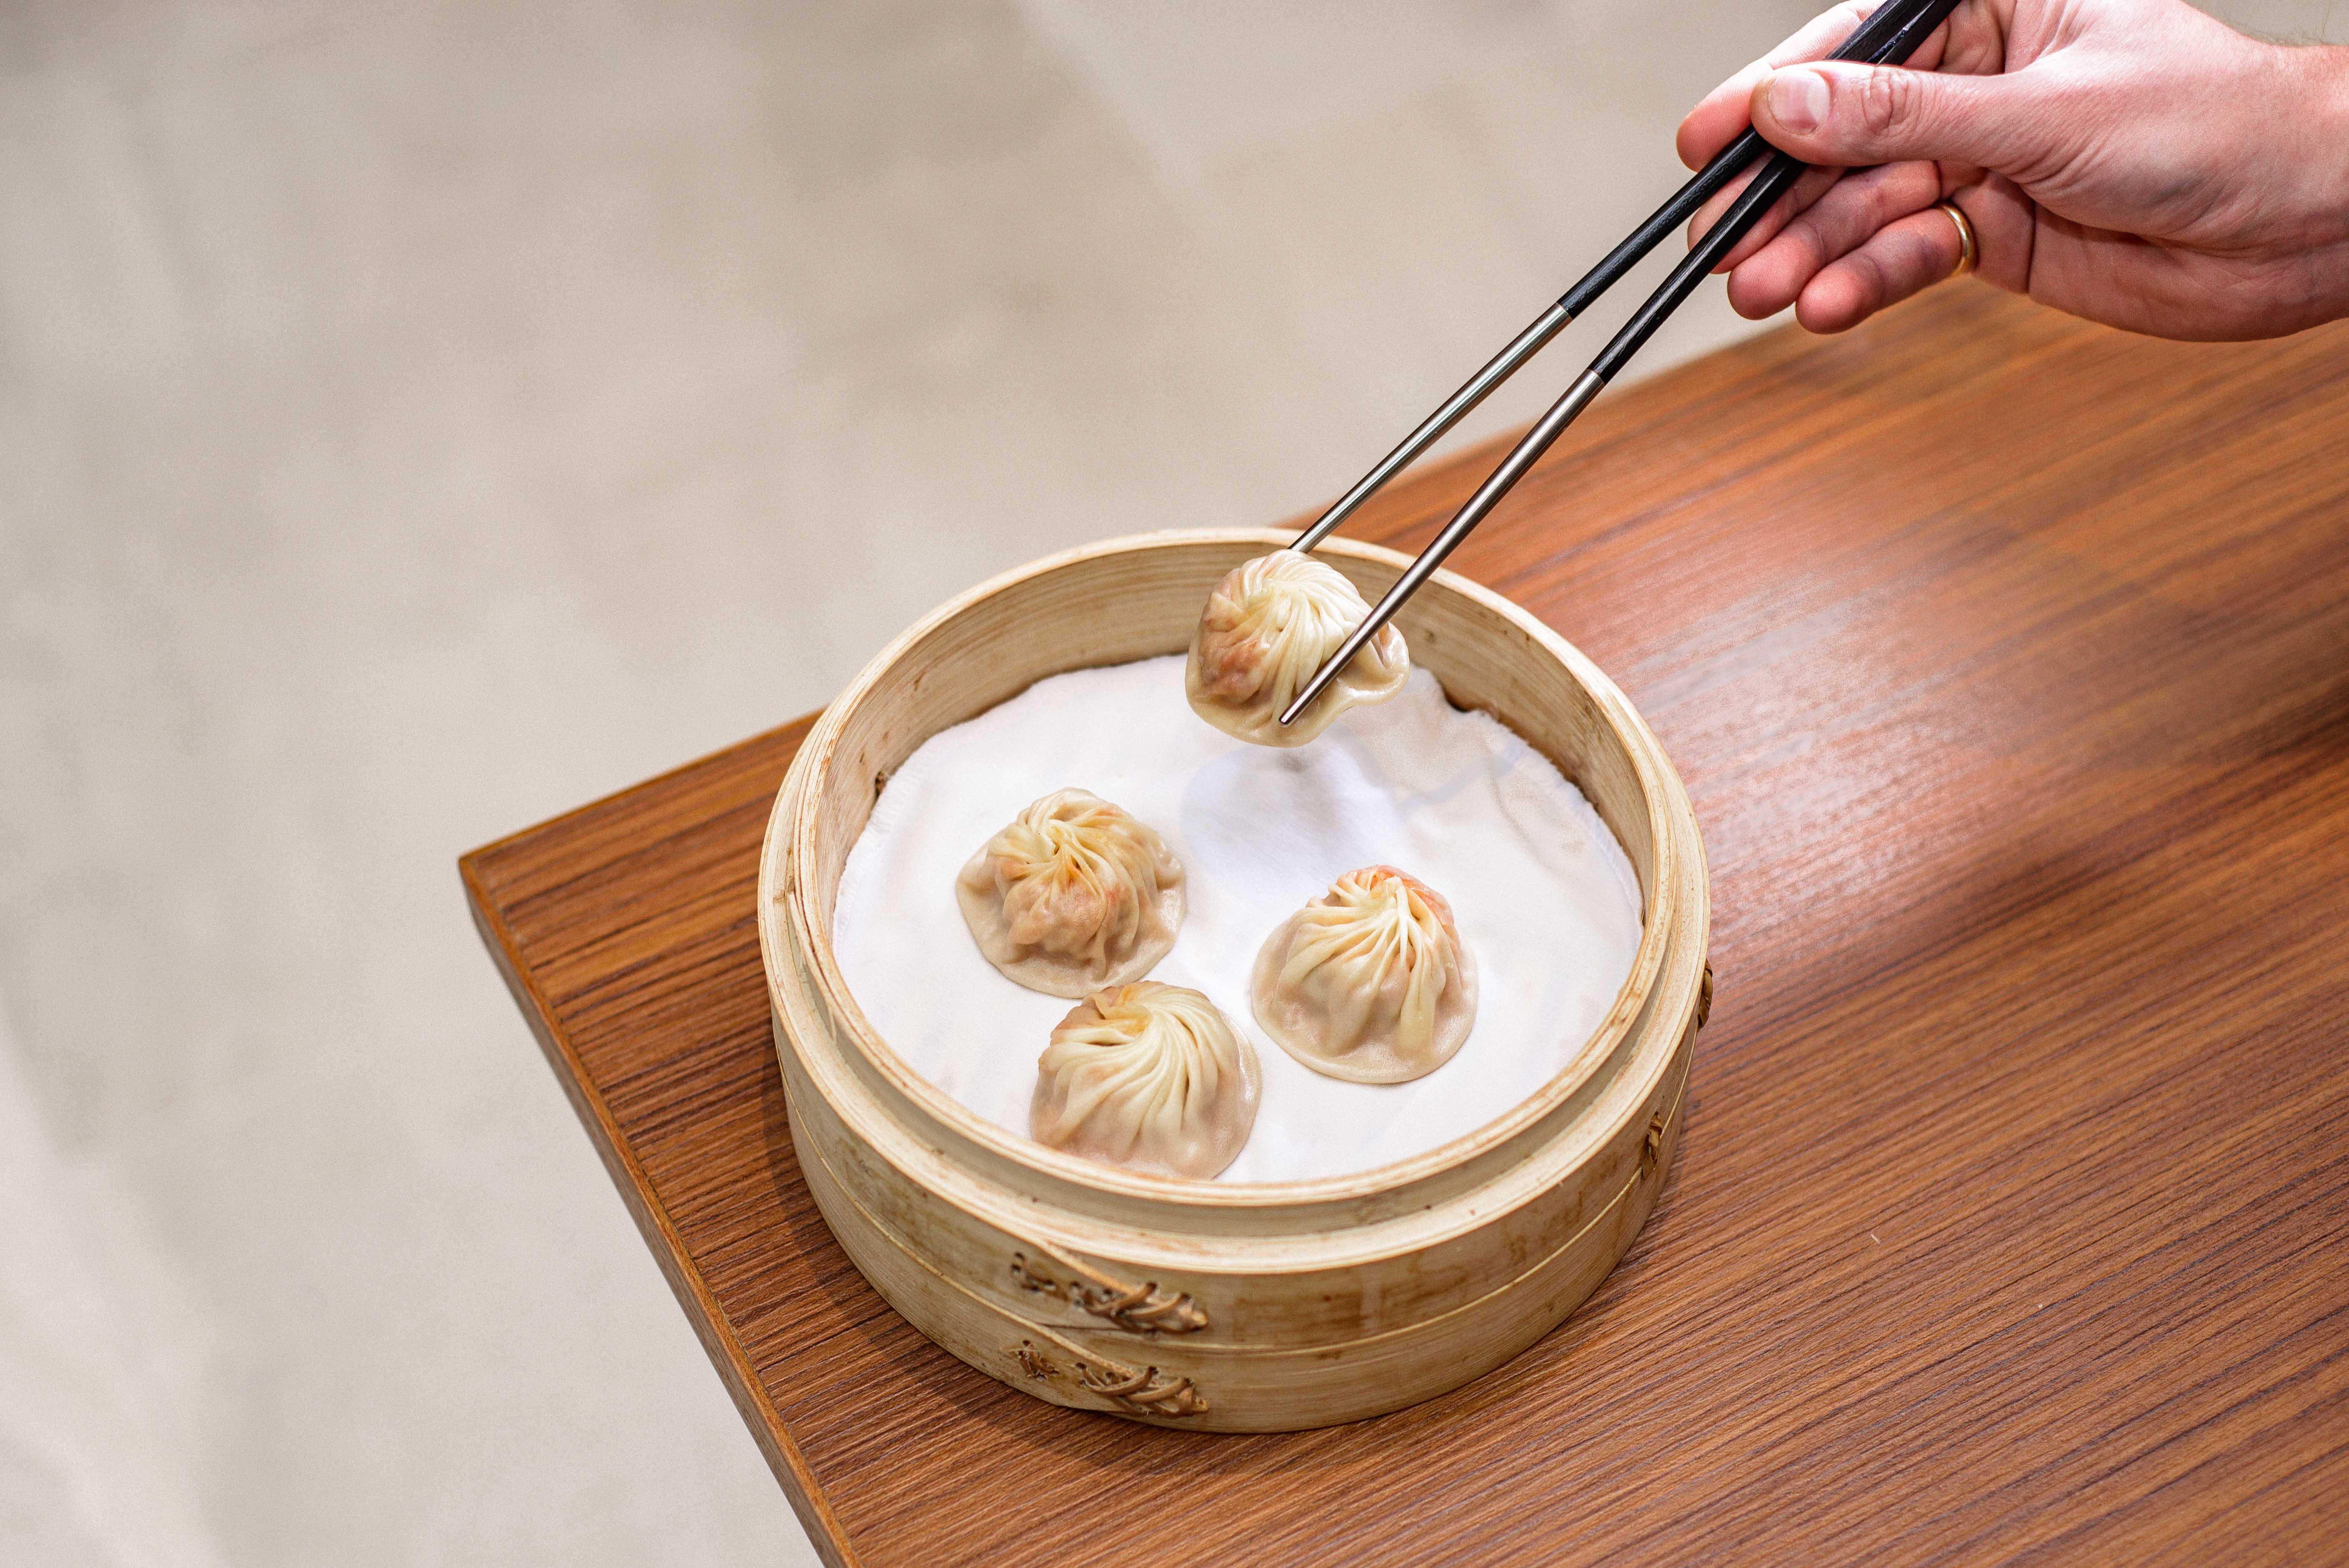 Din Tai Fung's xiaolongbao dumplings let down food critic Tim Hayward at world-famous dumpling chain restaurant in London